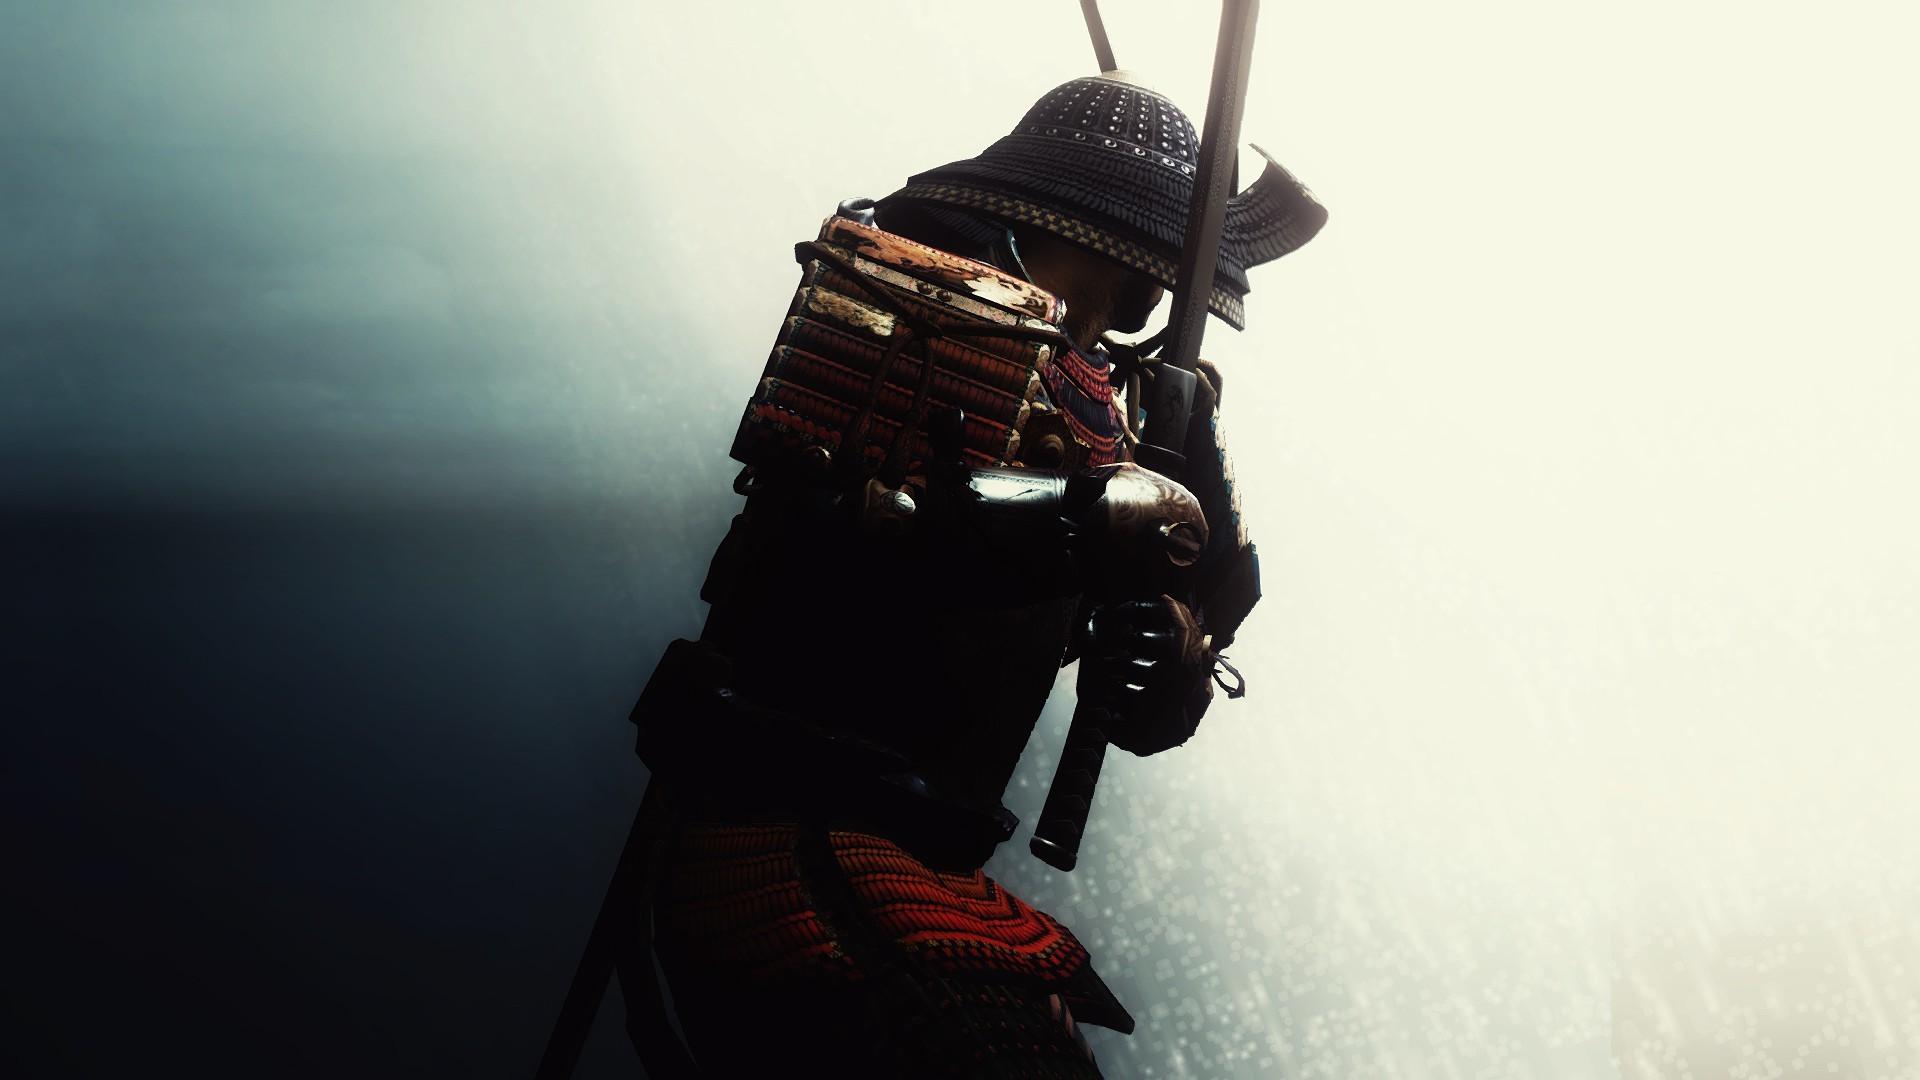 Res: 1920x1080, Samurai armor wallpapers mobile.